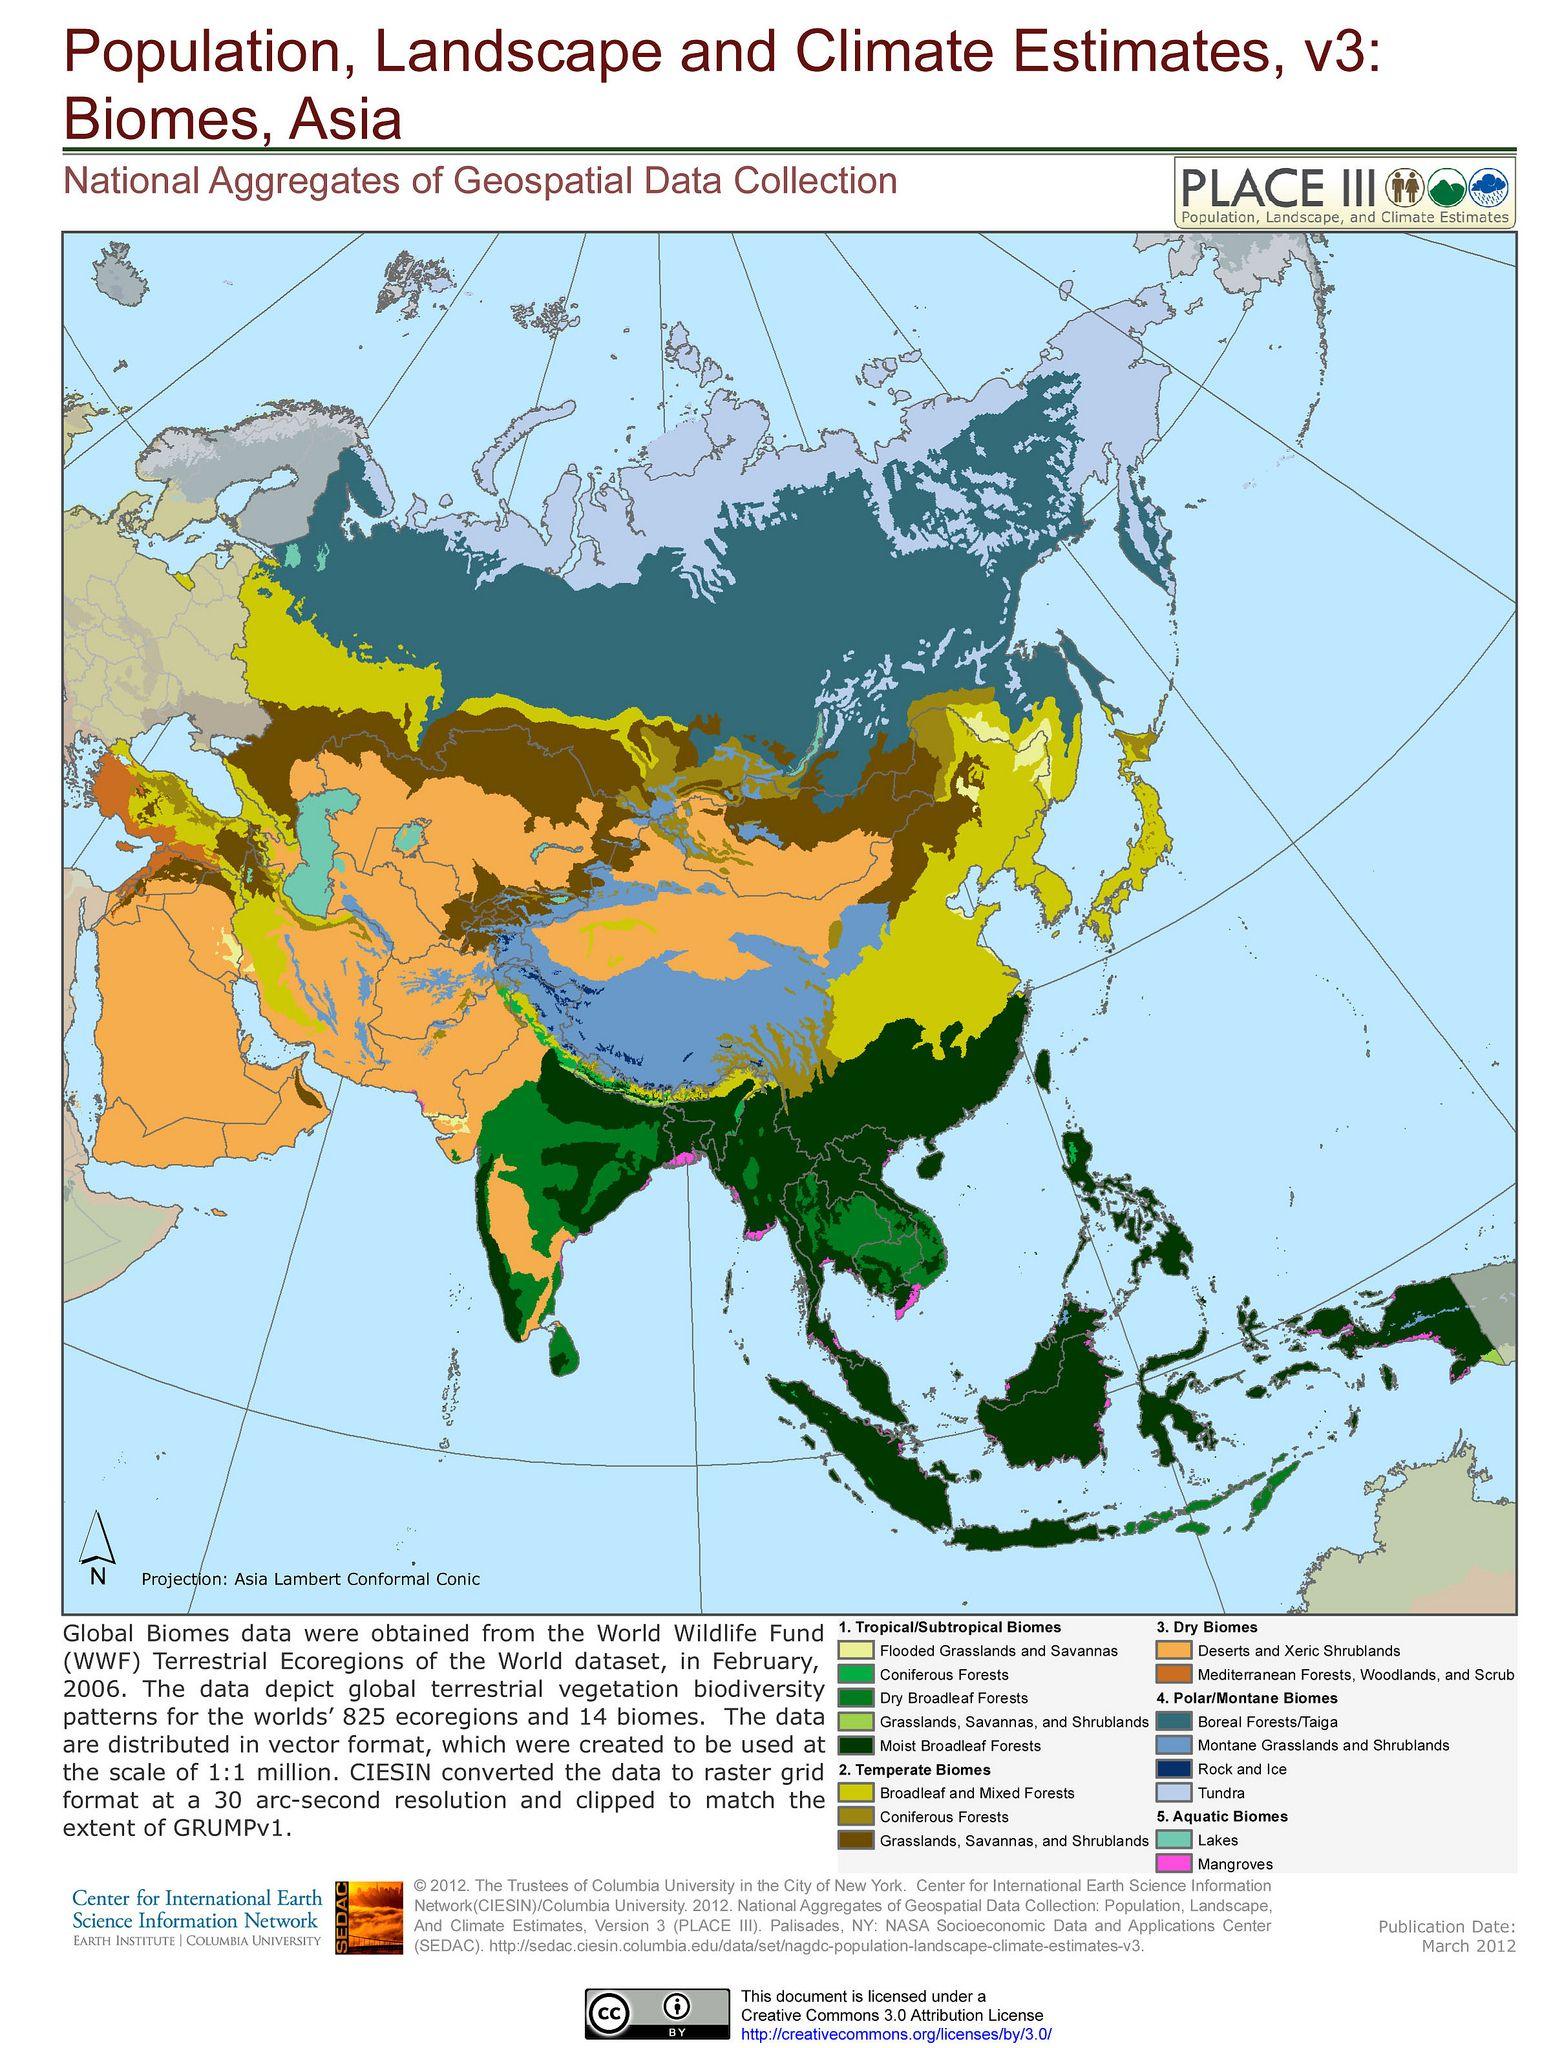 Biomes Asia